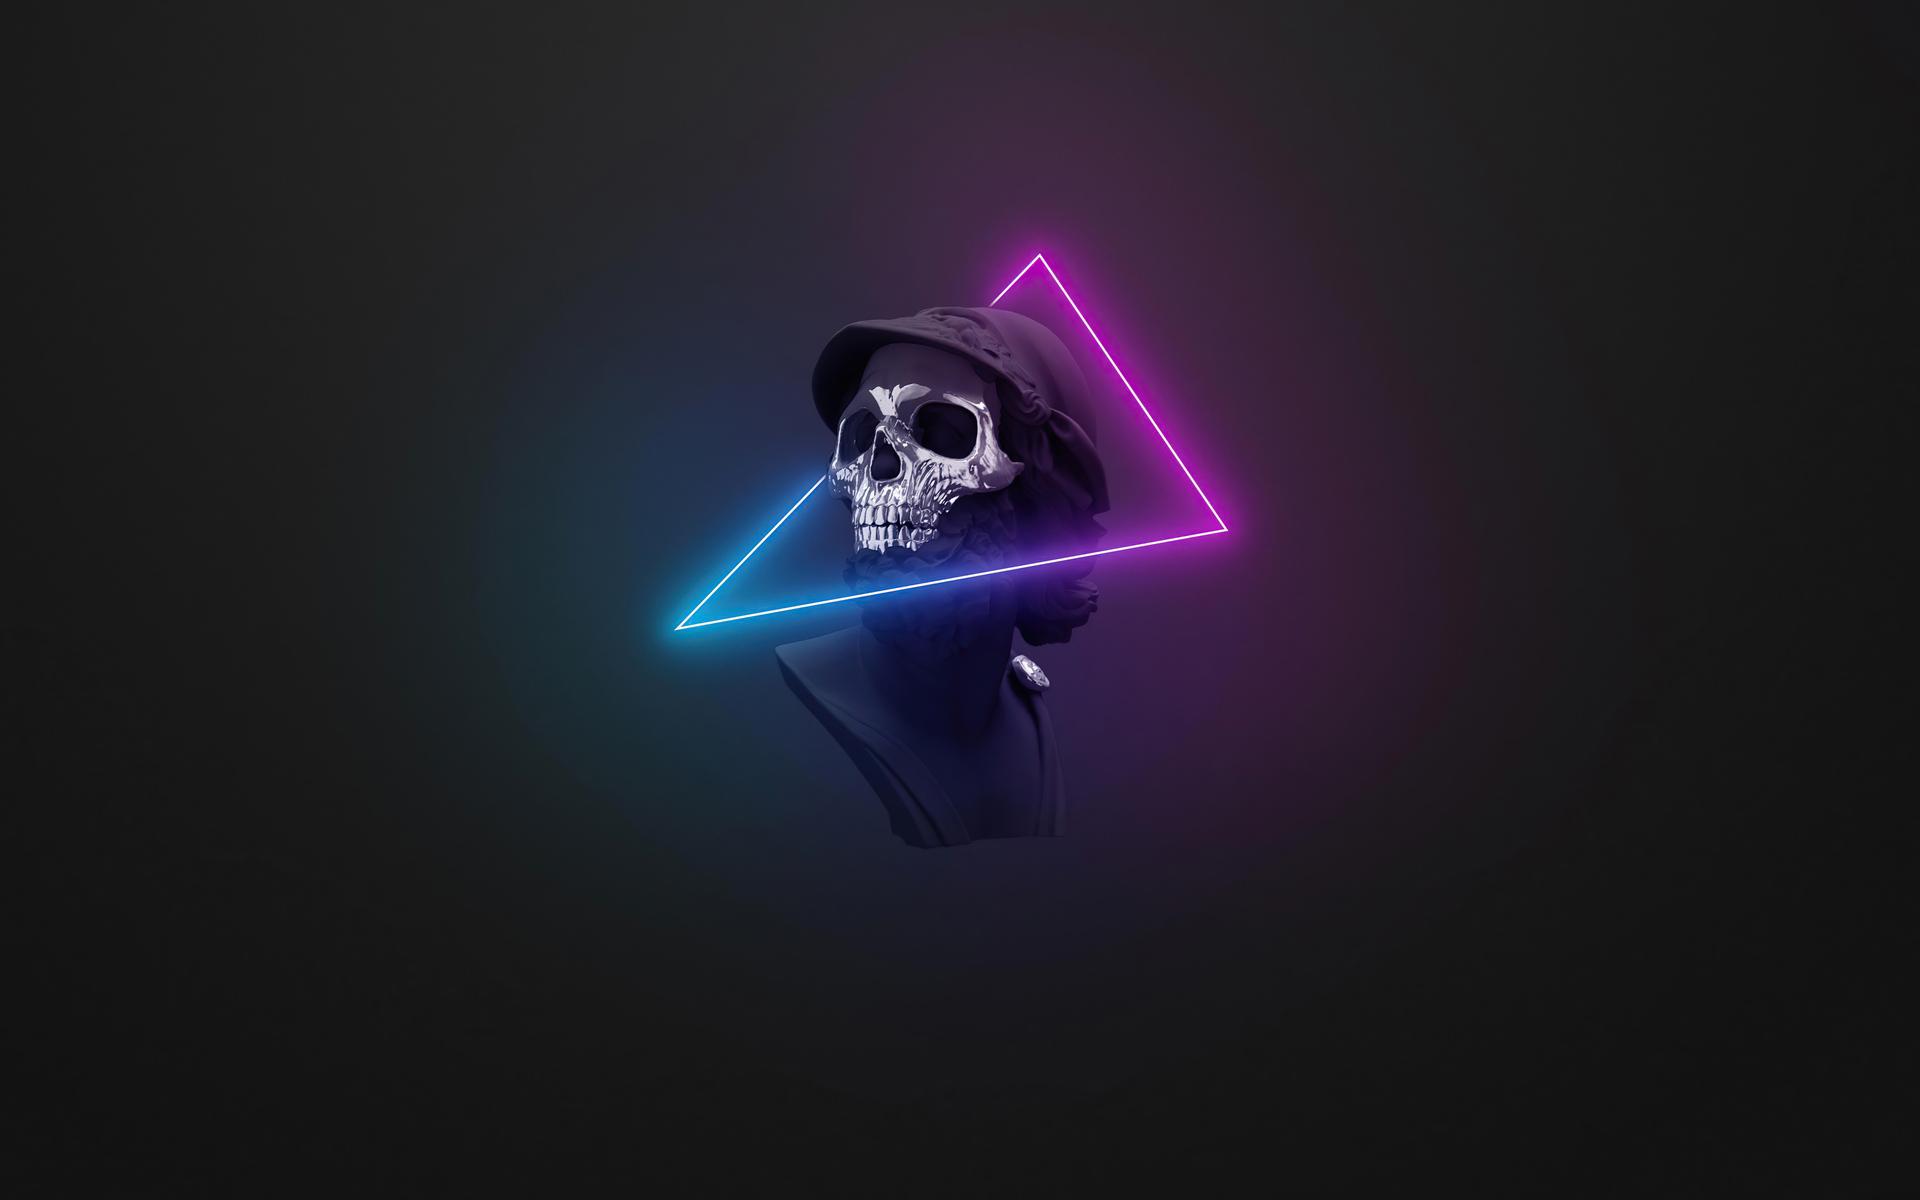 skull-neon-minimal-logo-5k-dq.jpg